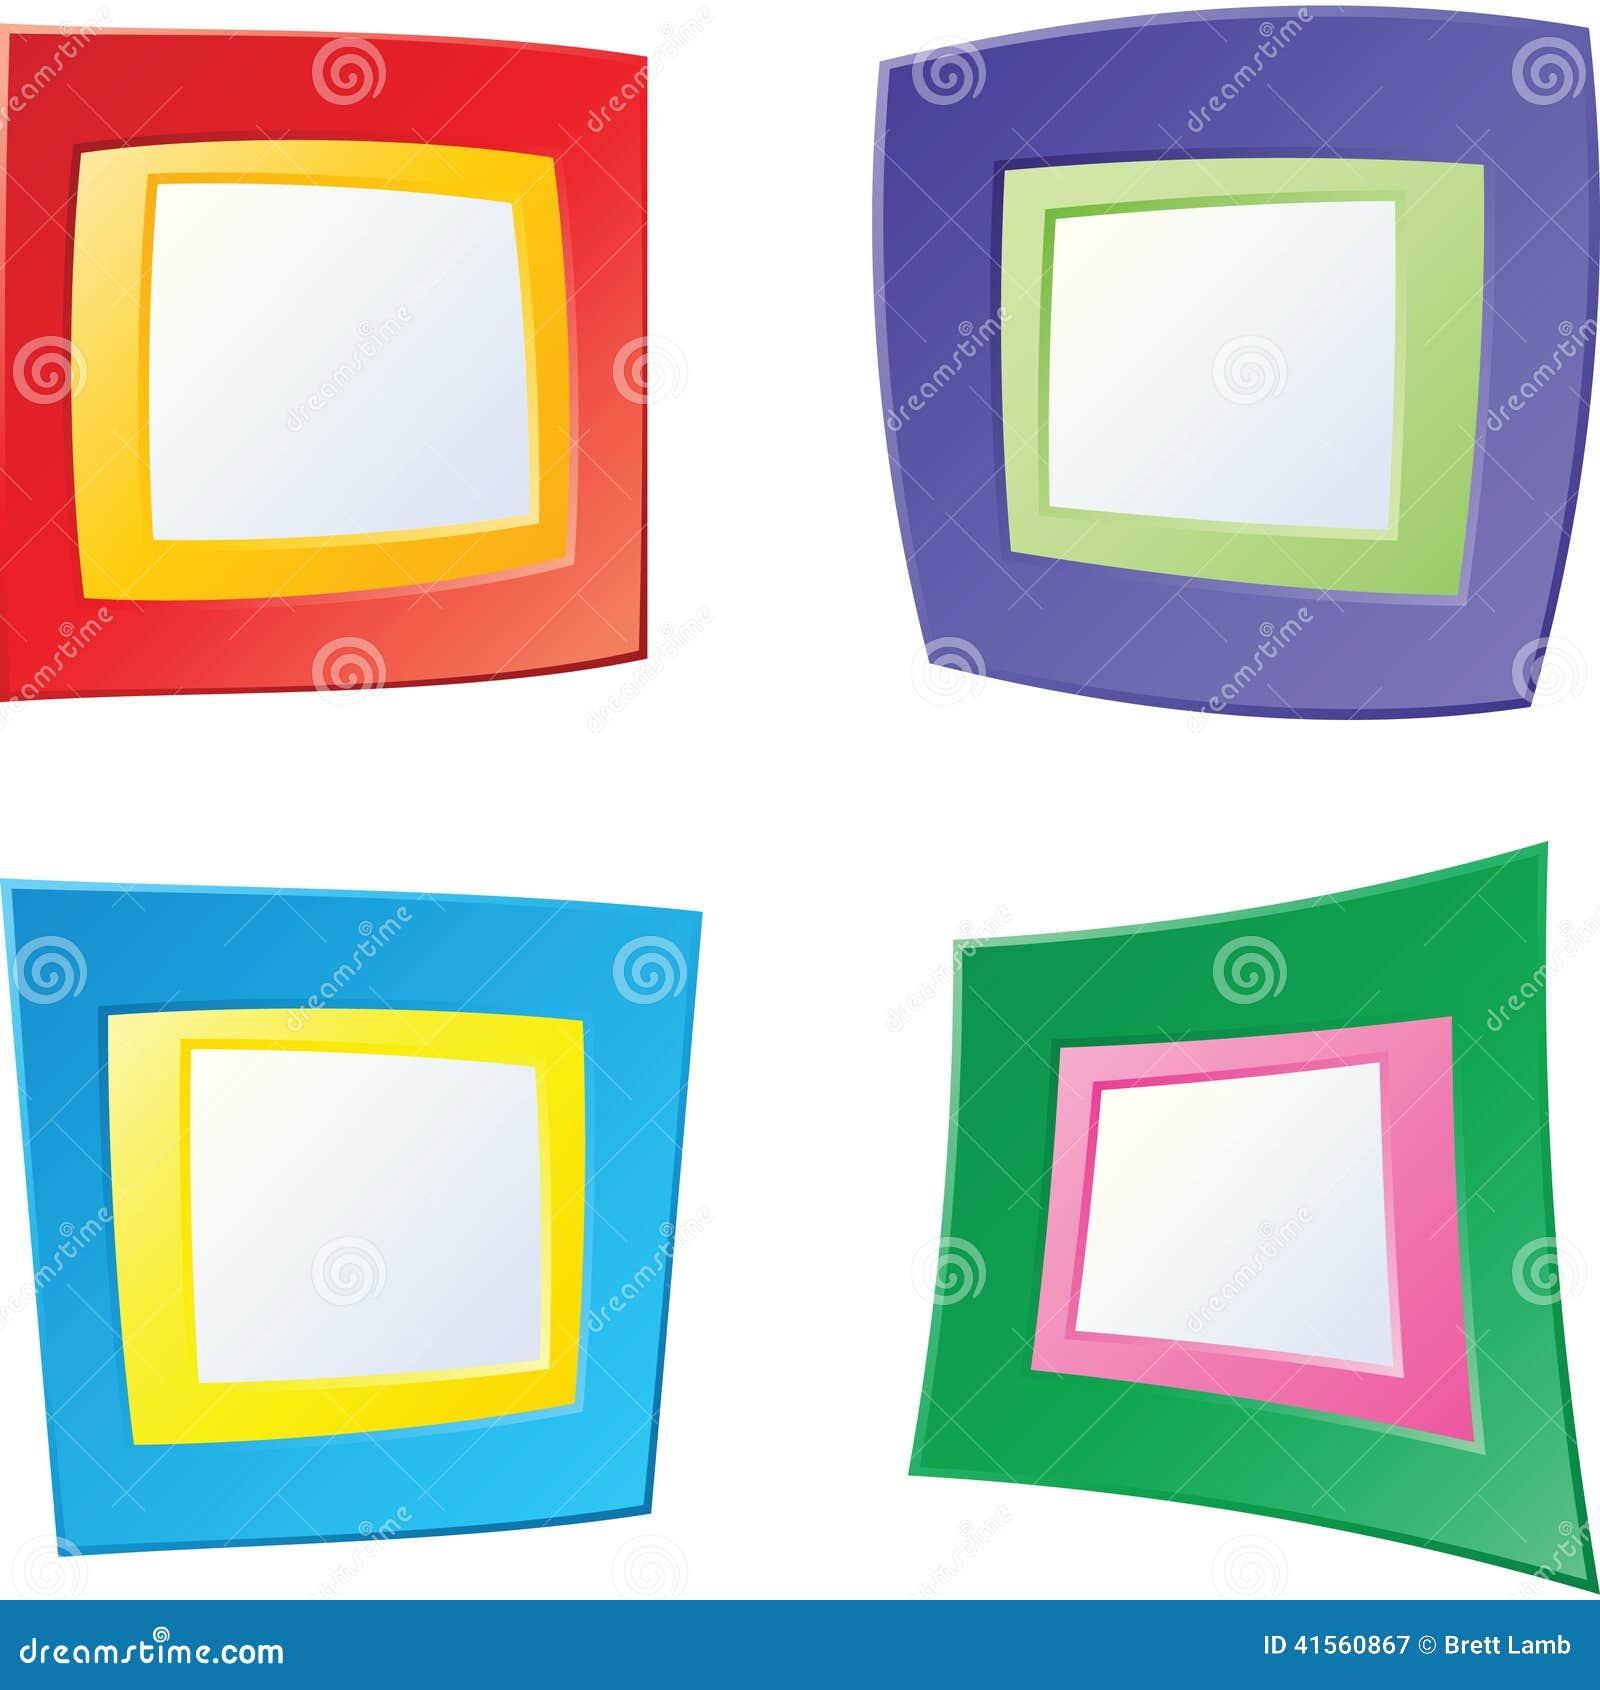 Fun Frames stock illustration. Illustration of decoration - 41560867